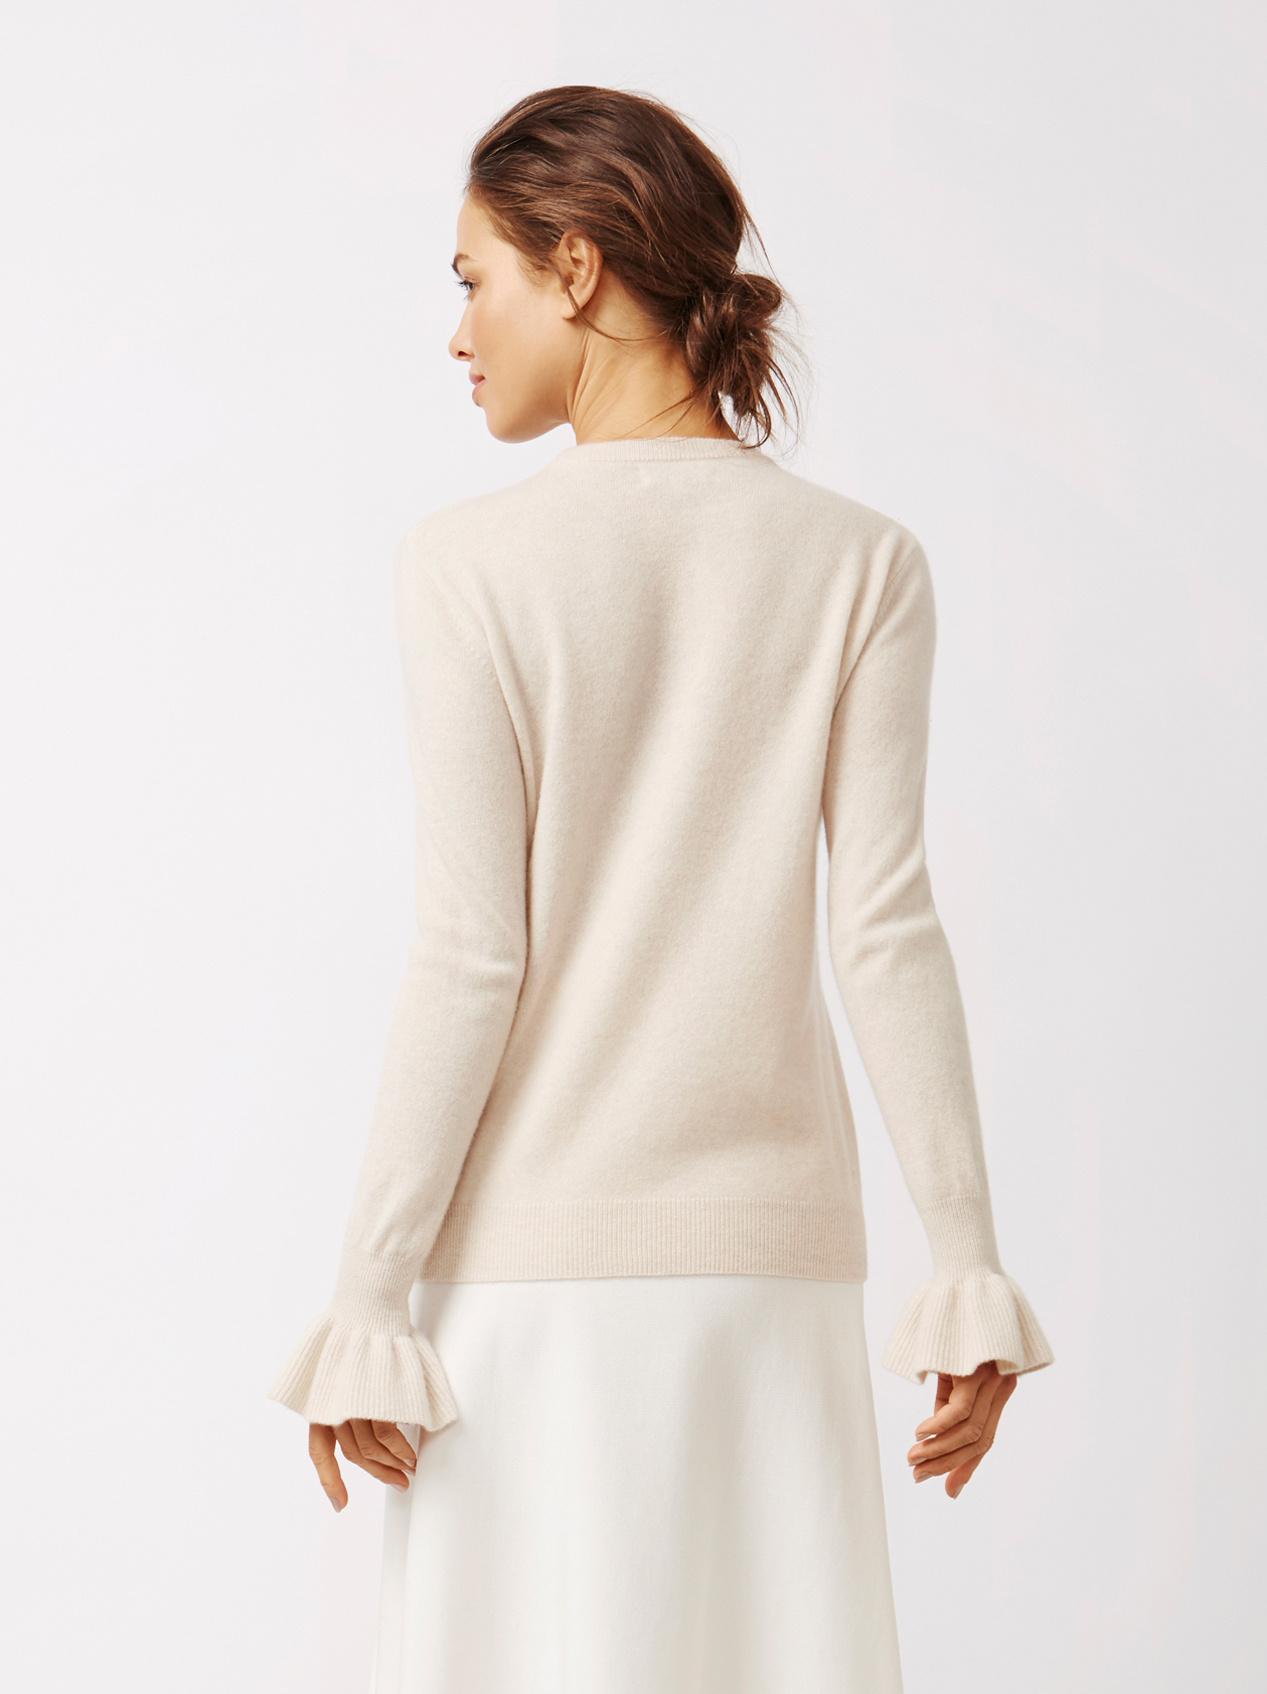 Soft Goat Women's Frill Sweater Beige